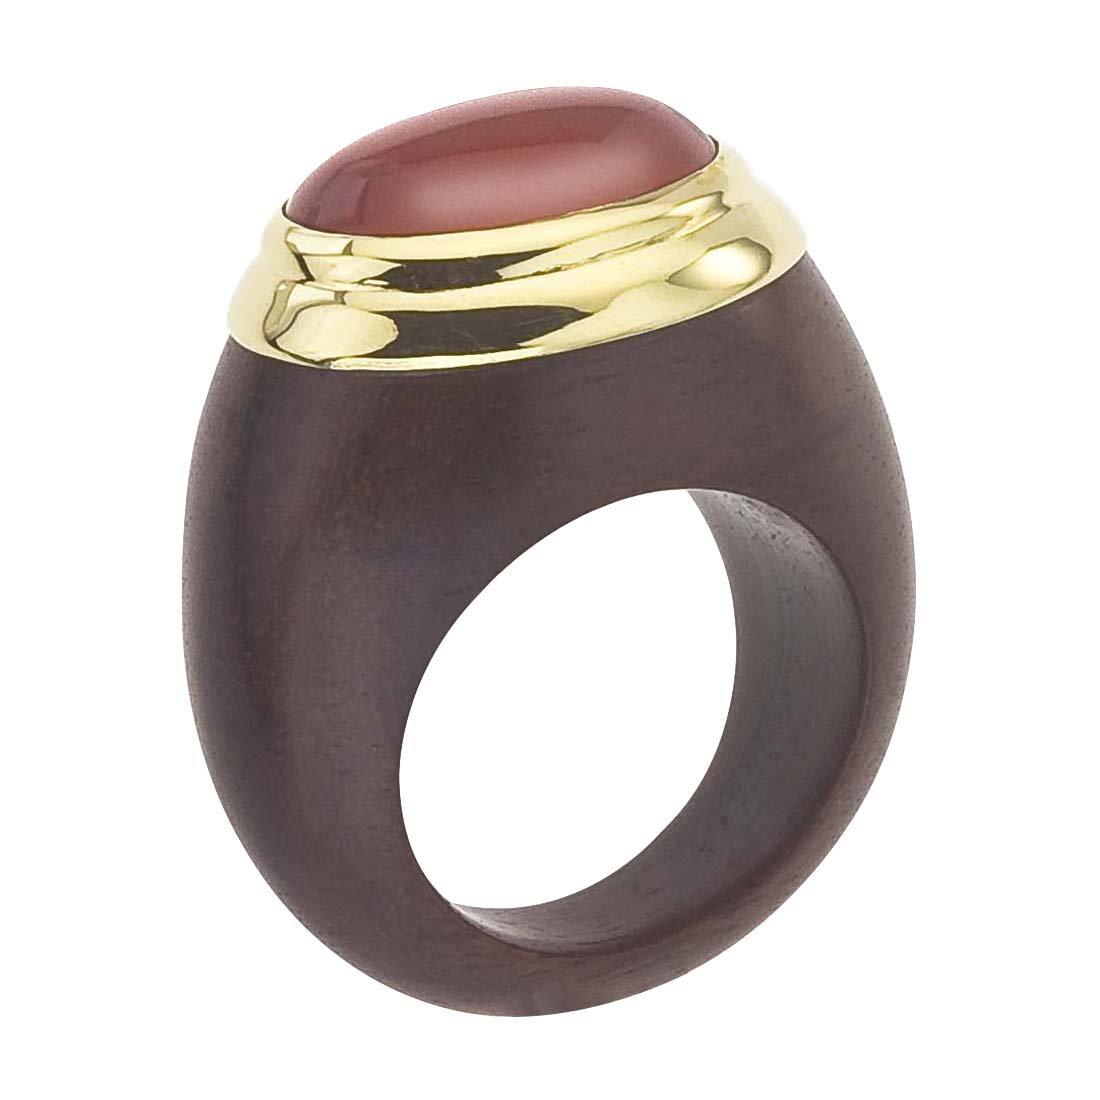 AX Jewelry 18K Vermeil, Rosewood & Carnelian Ring (7.5)